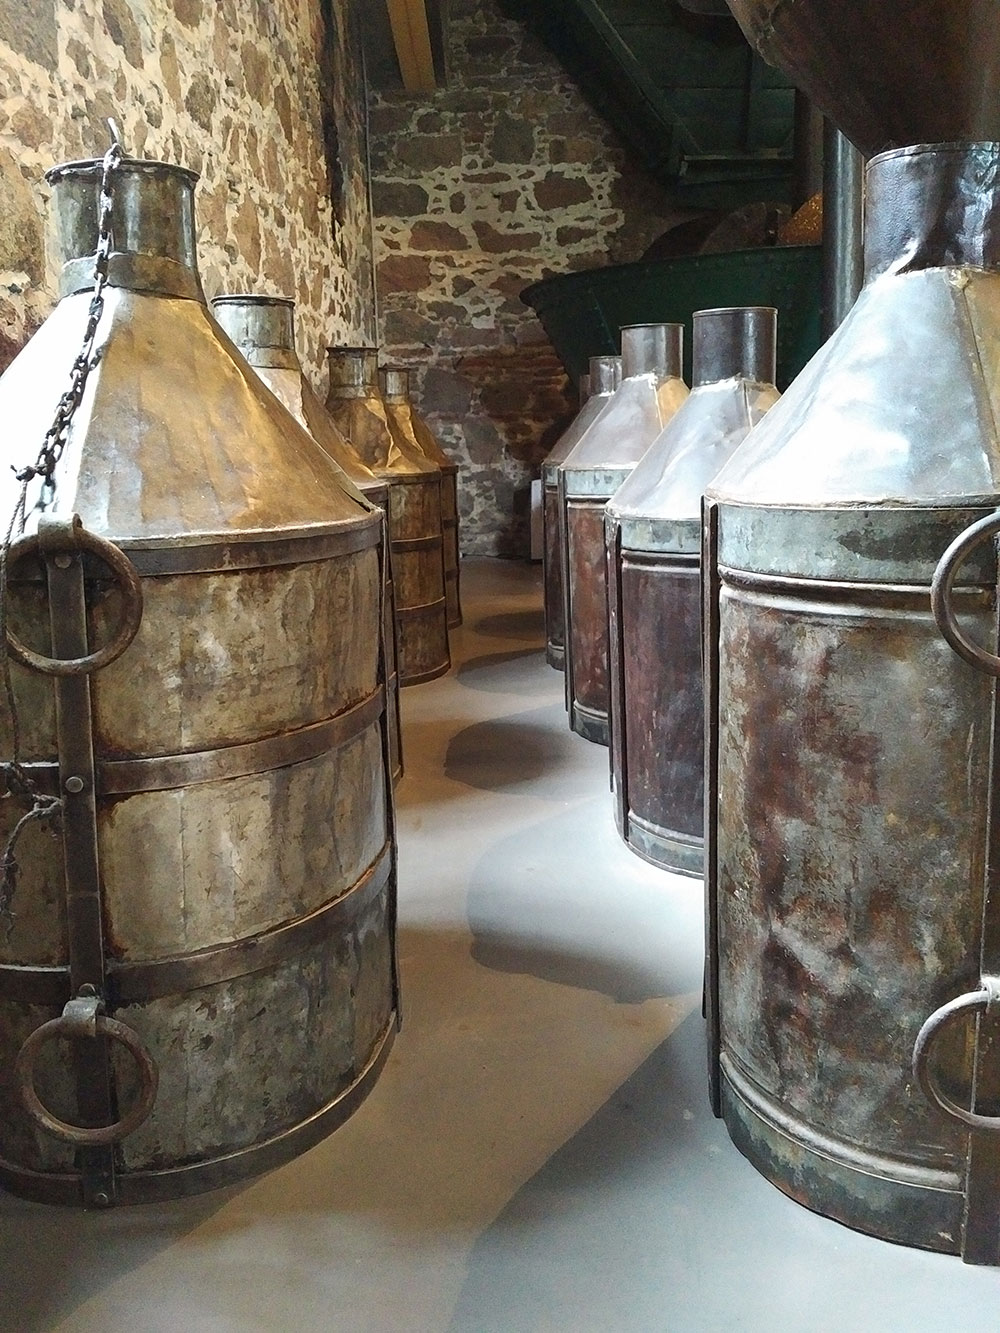 Olive oil storage